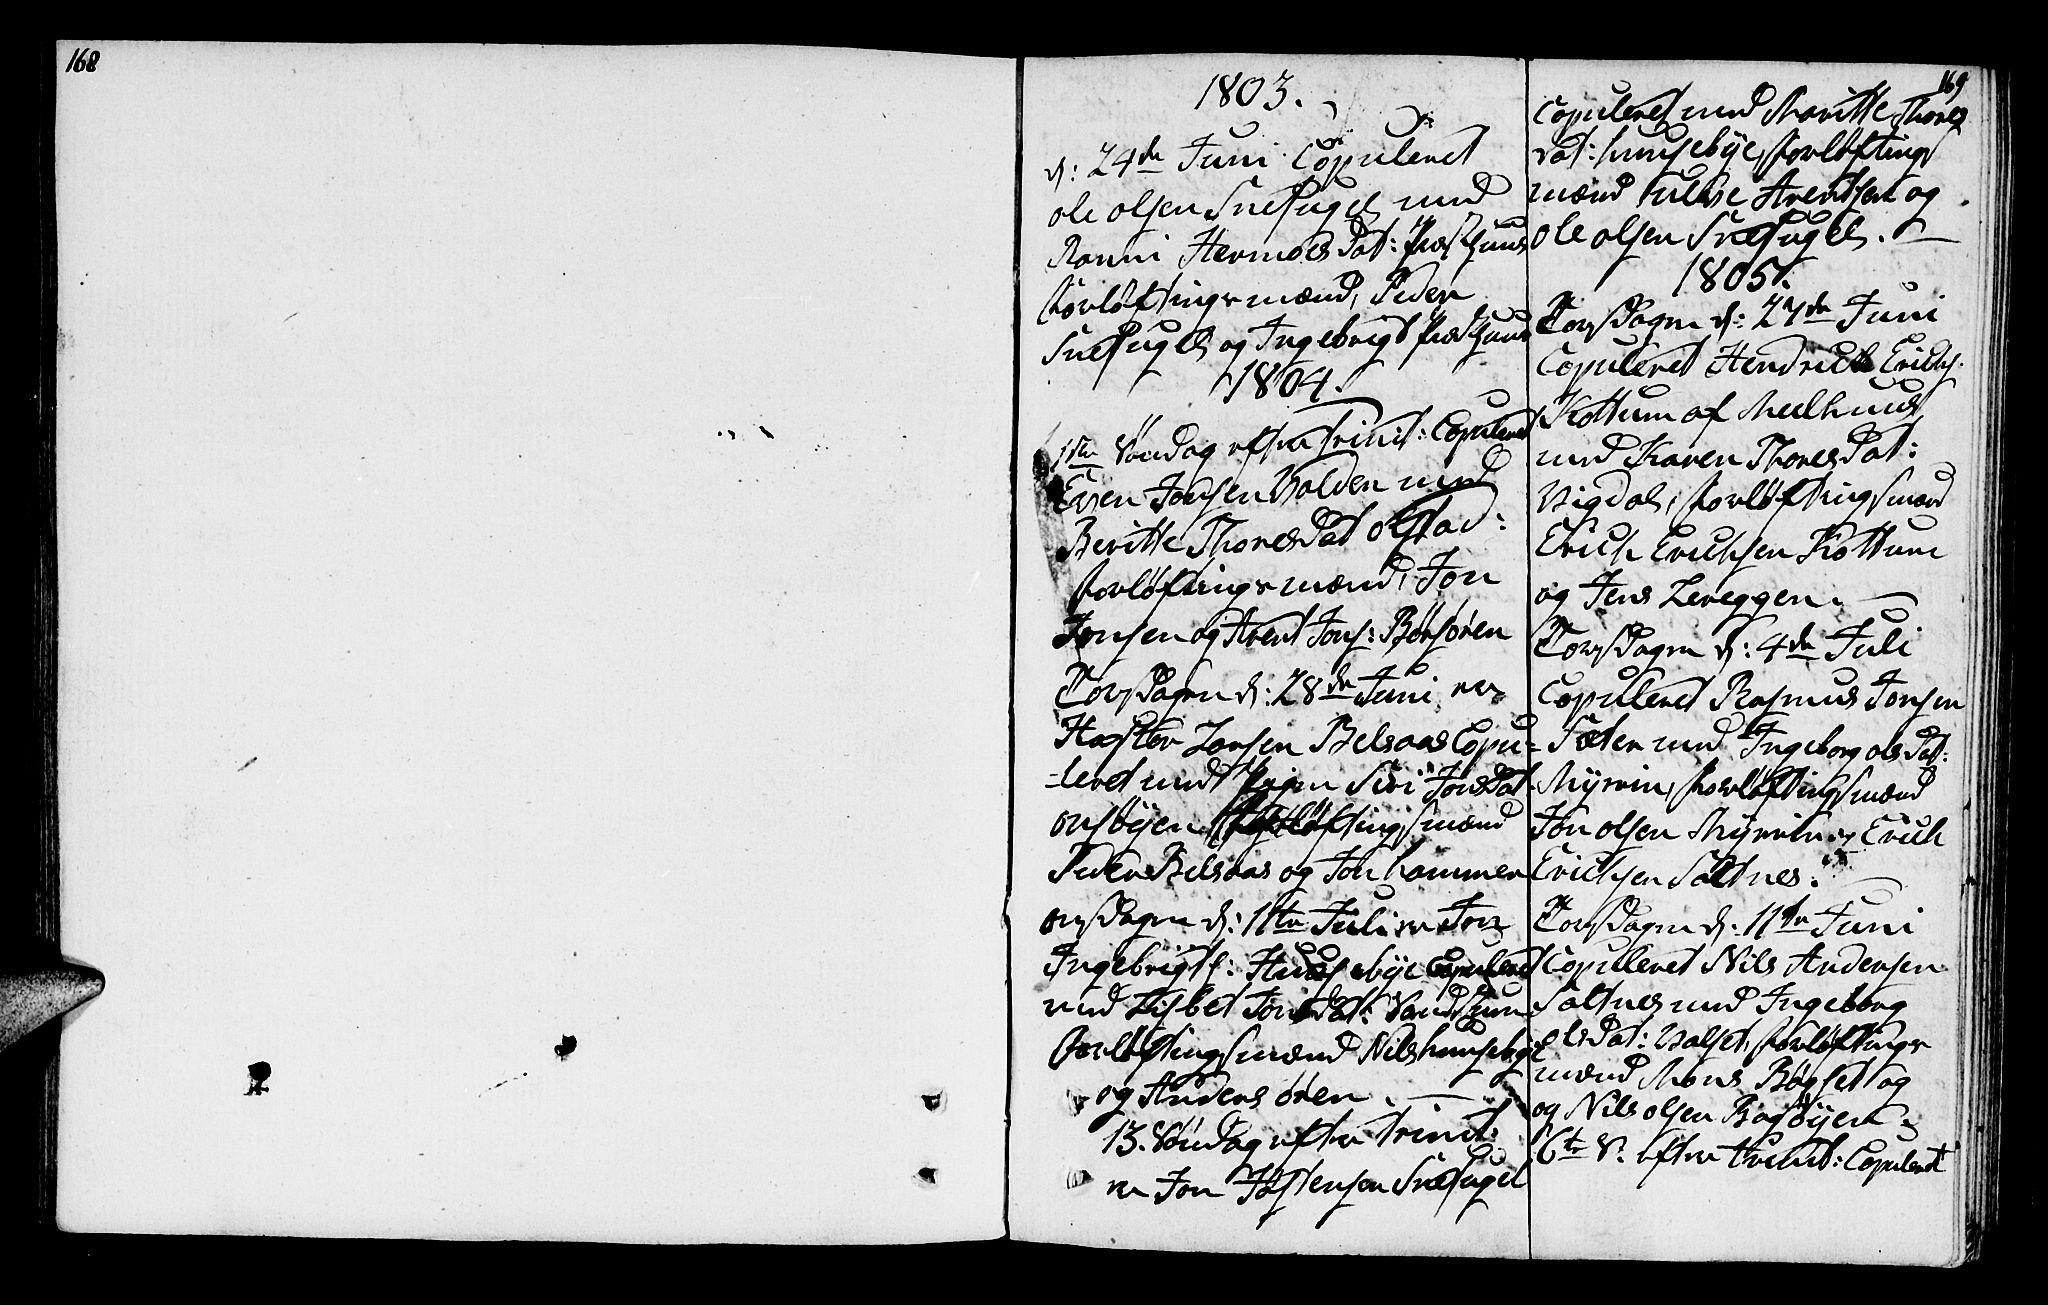 SAT, Ministerialprotokoller, klokkerbøker og fødselsregistre - Sør-Trøndelag, 666/L0785: Parish register (official) no. 666A03, 1803-1816, p. 168-169